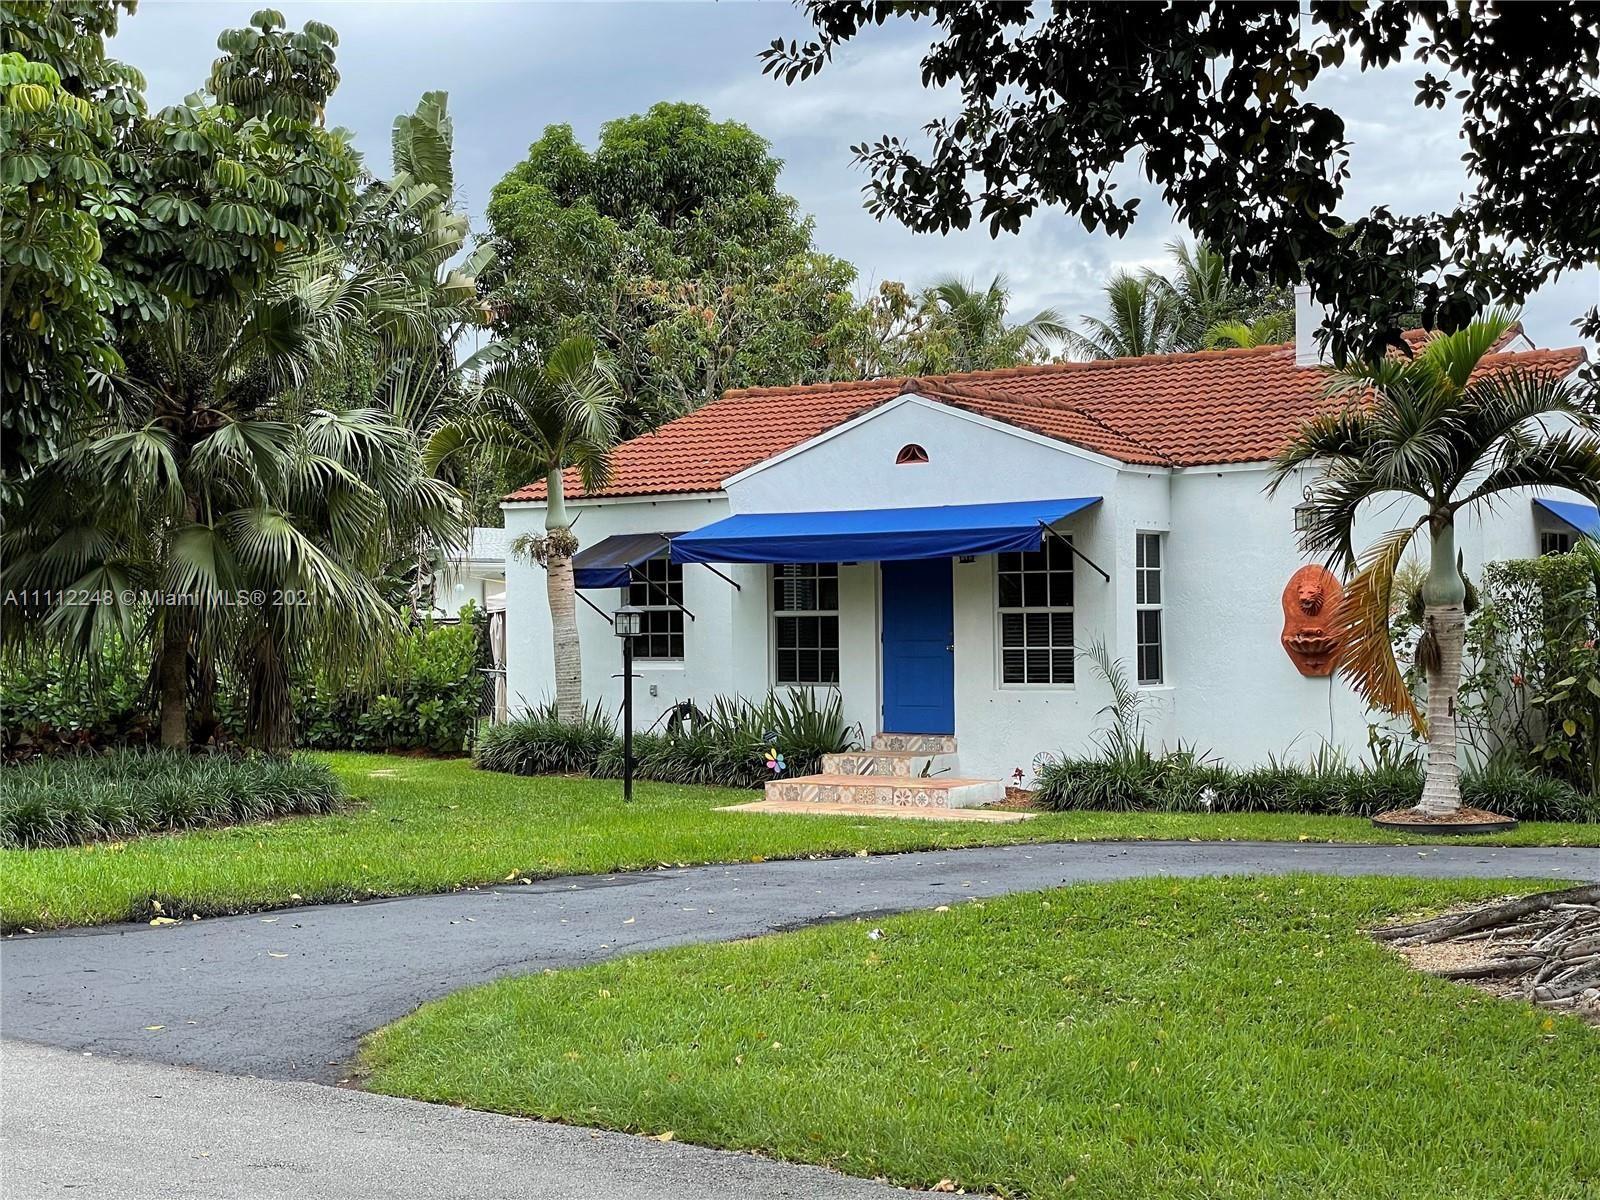 Photo of 1008 SW 45th Ave, Miami, FL 33134 (MLS # A11112248)